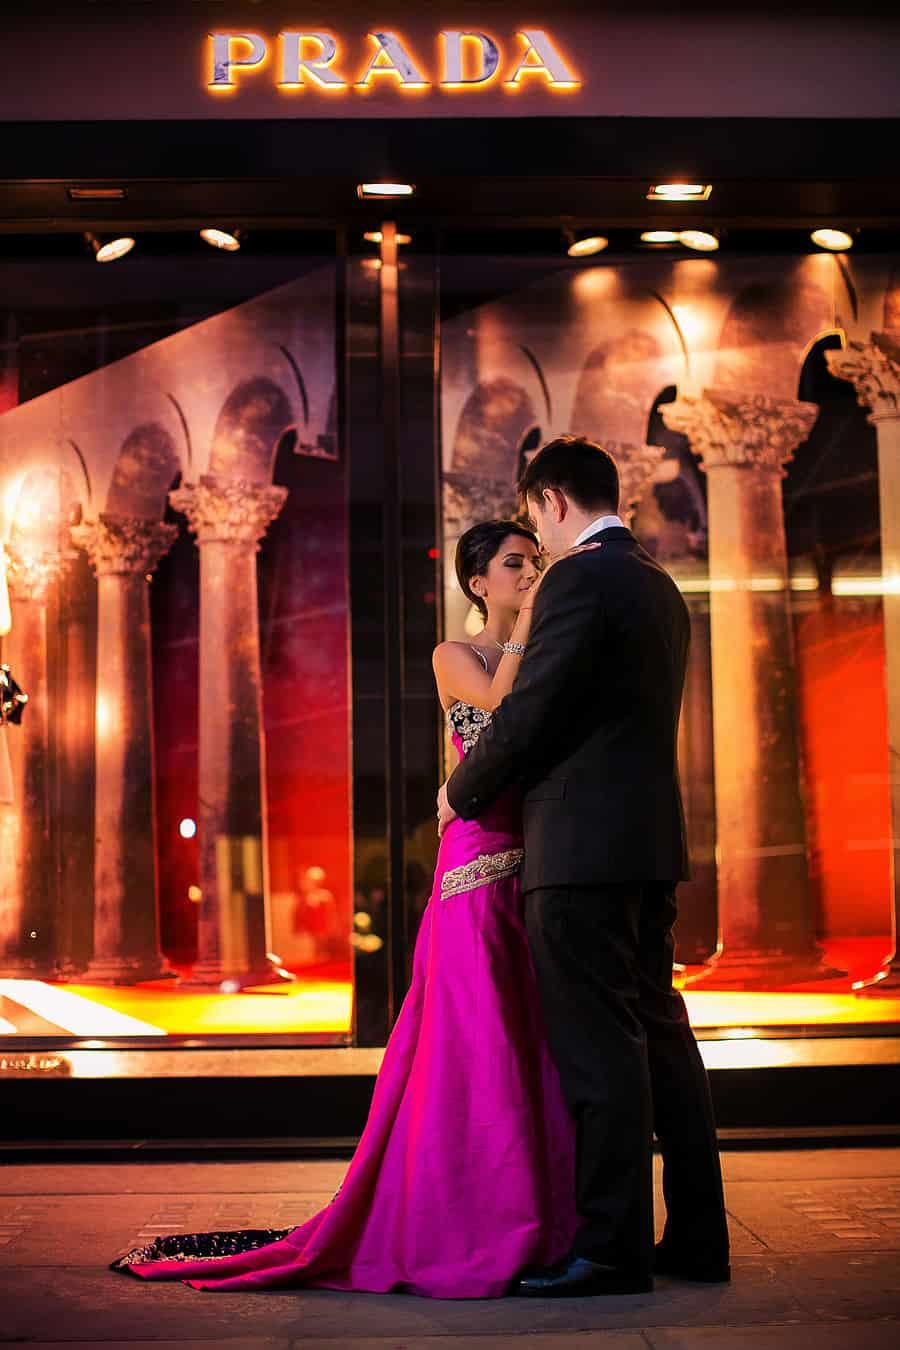 IMAGE: http://www.f5blog.co.uk/wp-content/uploads/2012/10/london_wedding_photography_jumeirah_carlton_tower_asian_rahul-73.jpg